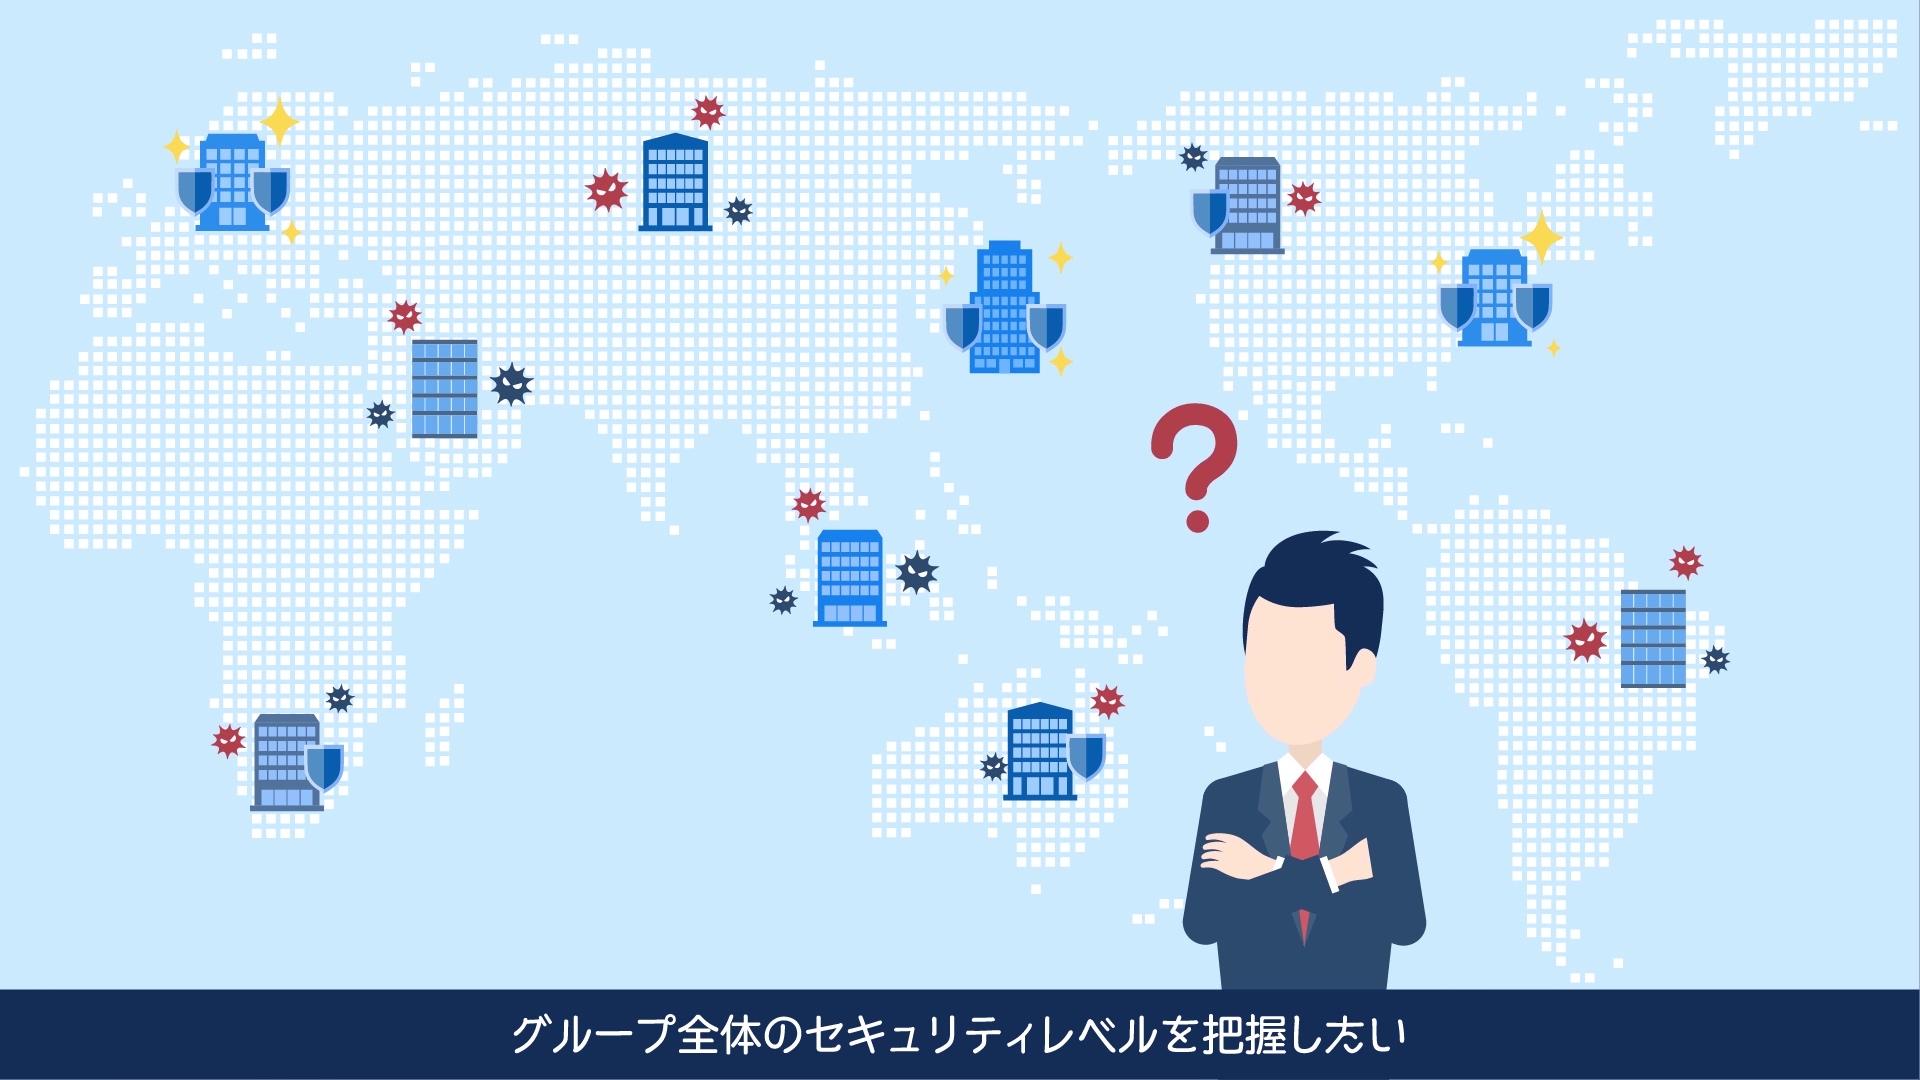 secure_sketch_groups_21_japanese